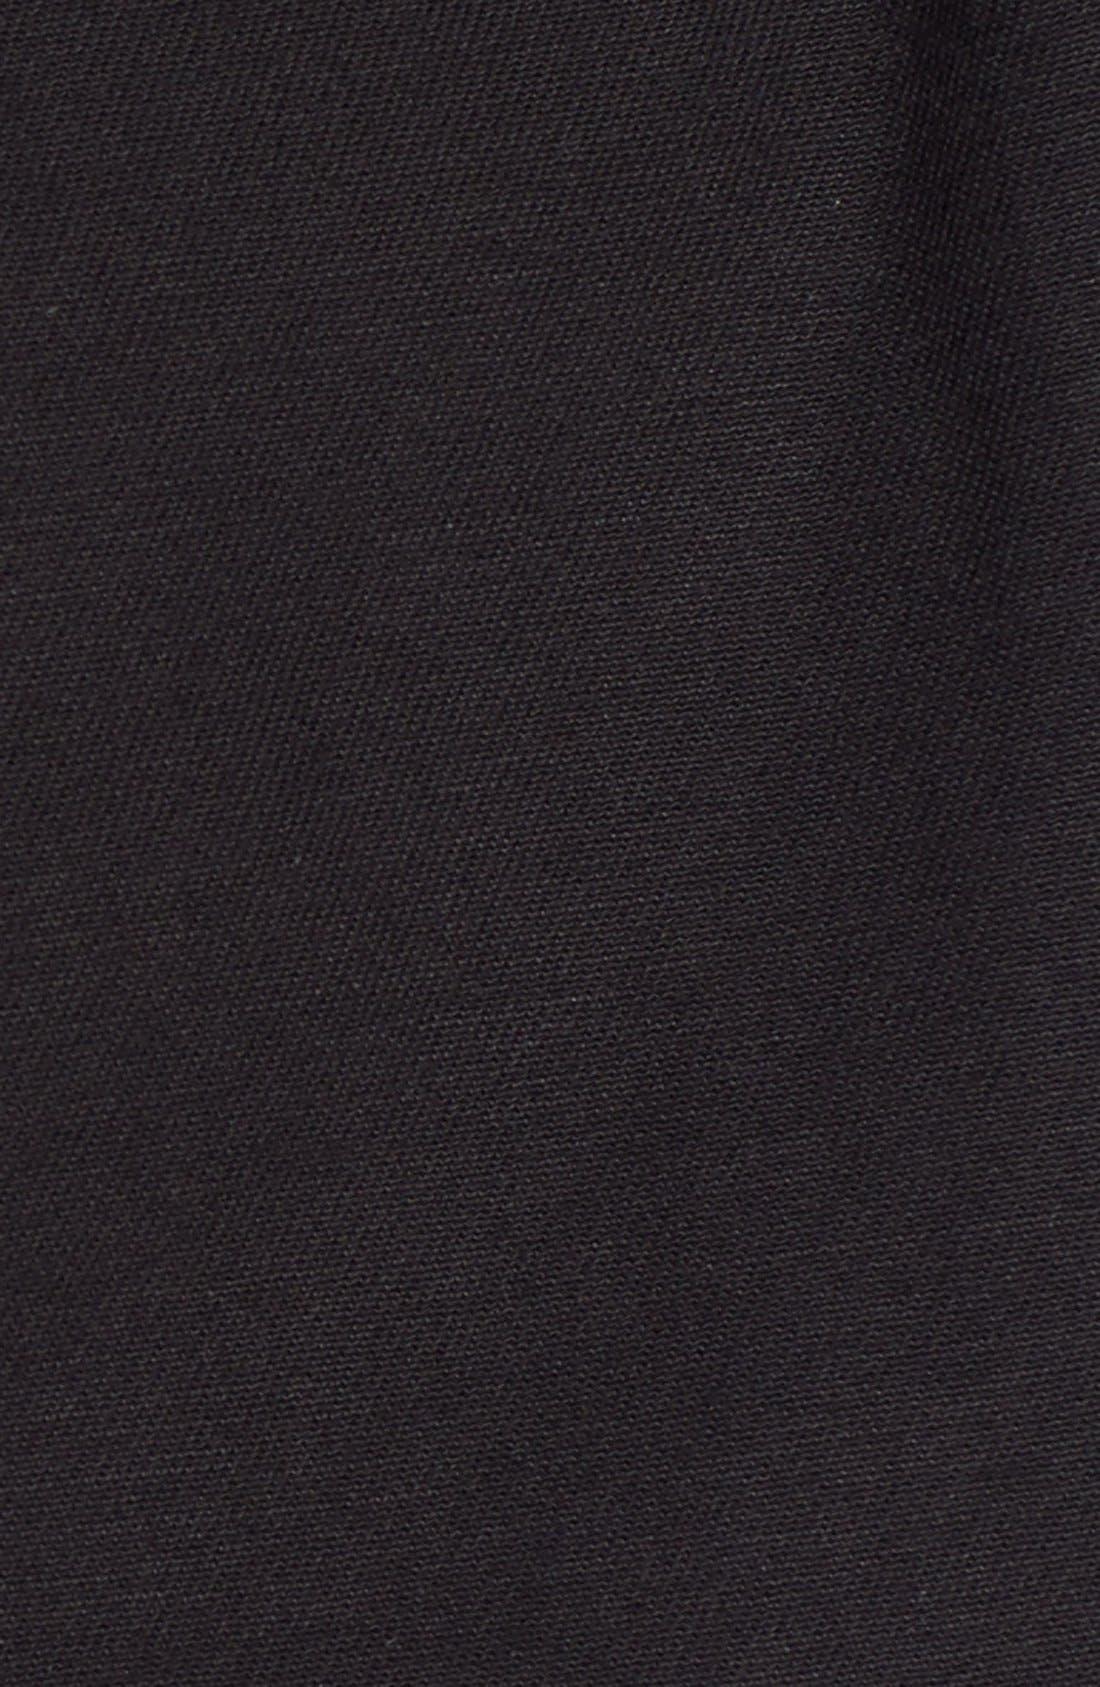 Cotton Twill Utility Jacket,                             Alternate thumbnail 3, color,                             001